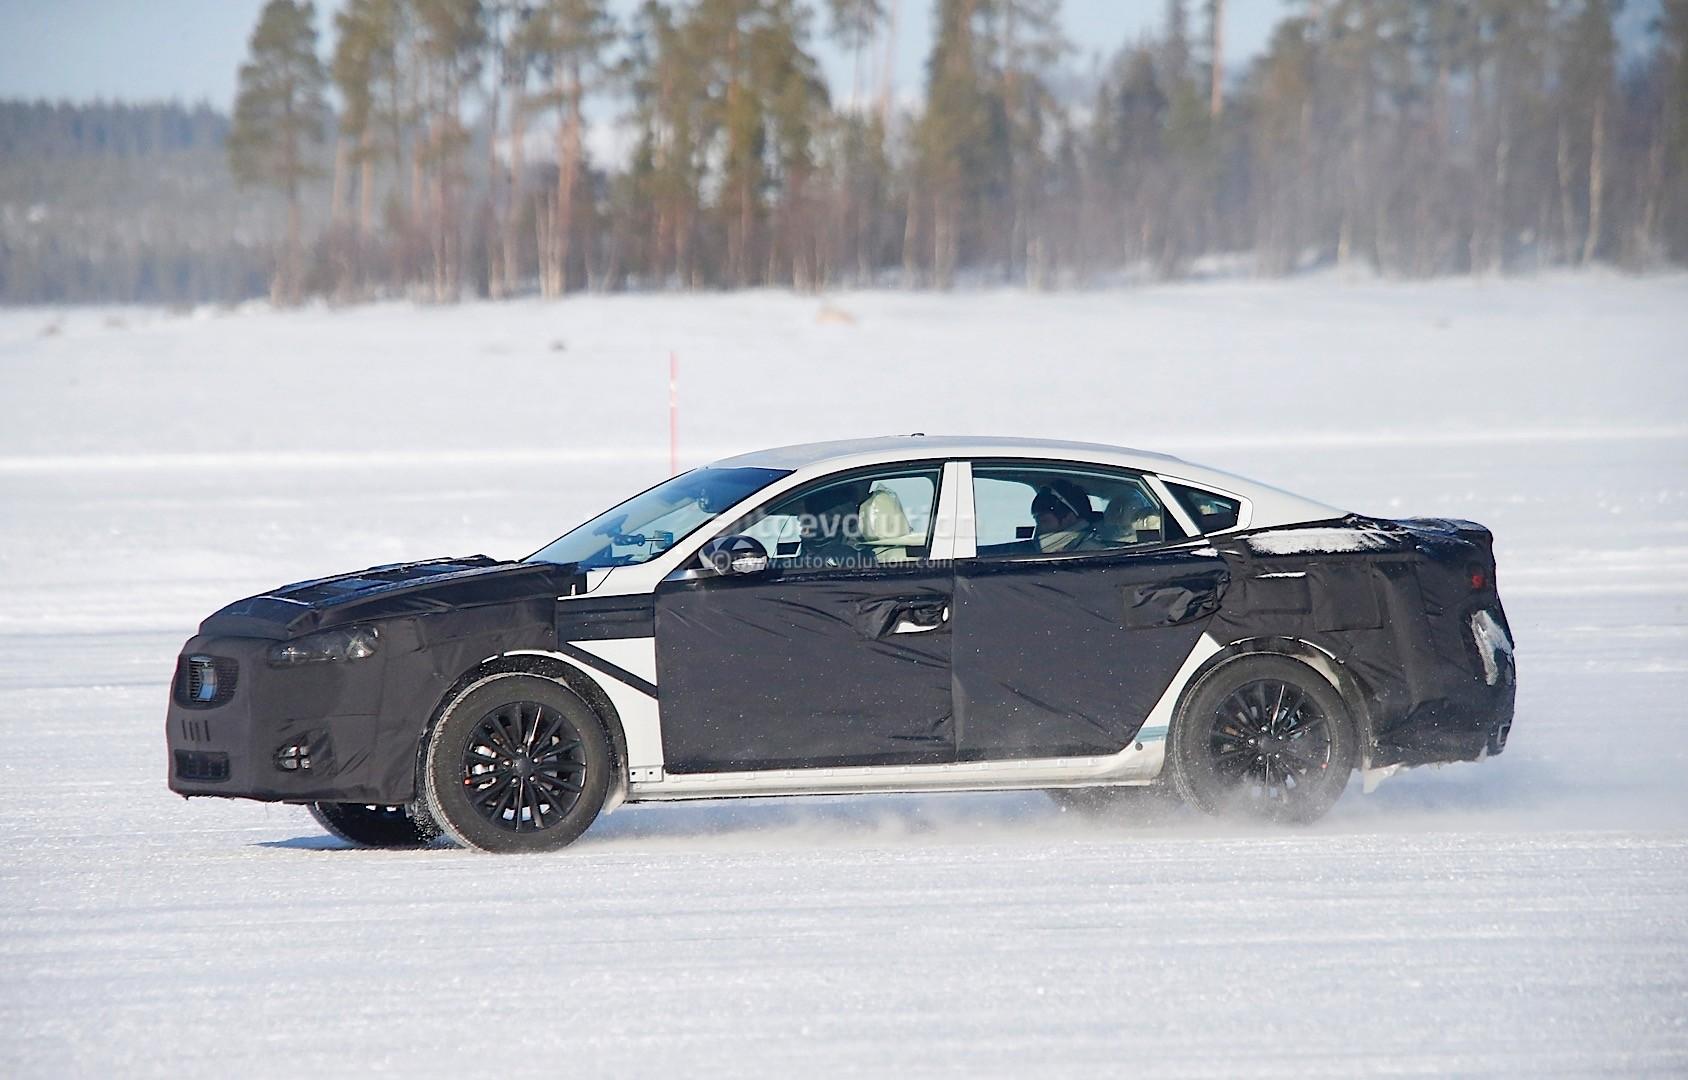 2015 - [Kia] Cadenza II 2016-kia-k7-cadenza-spied-testing-in-sweden-photo-gallery_3